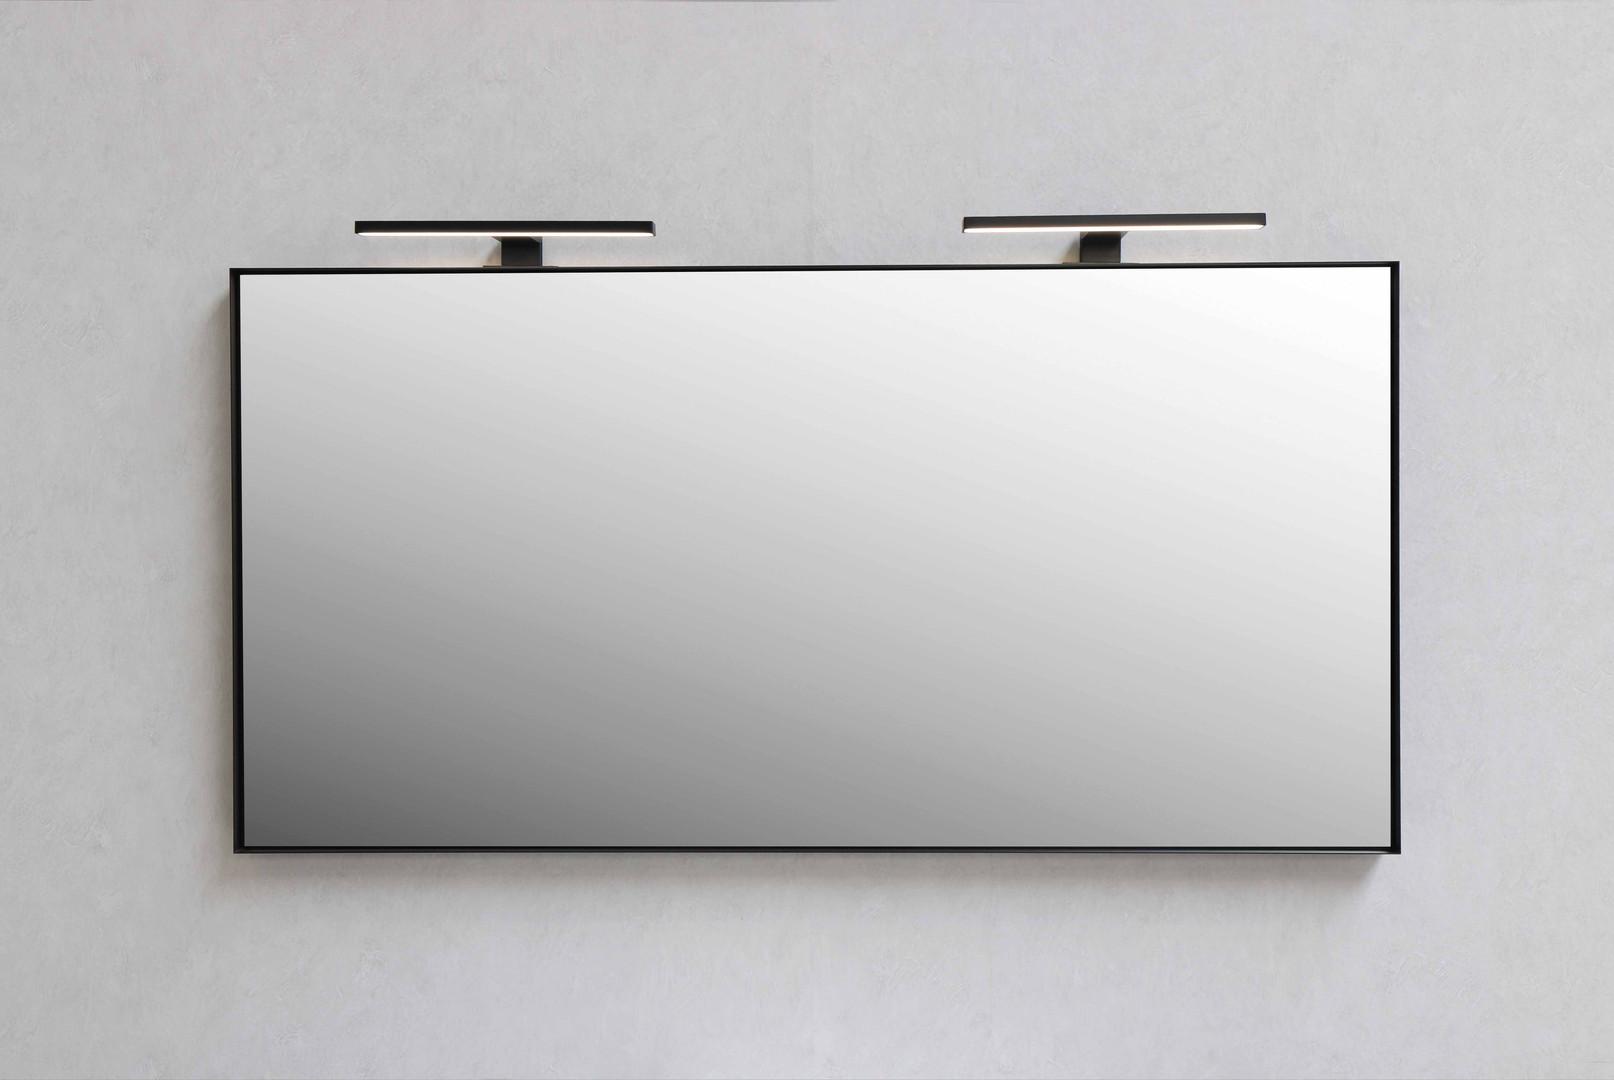 Wastafel polystone Loft 120 cm - onderka